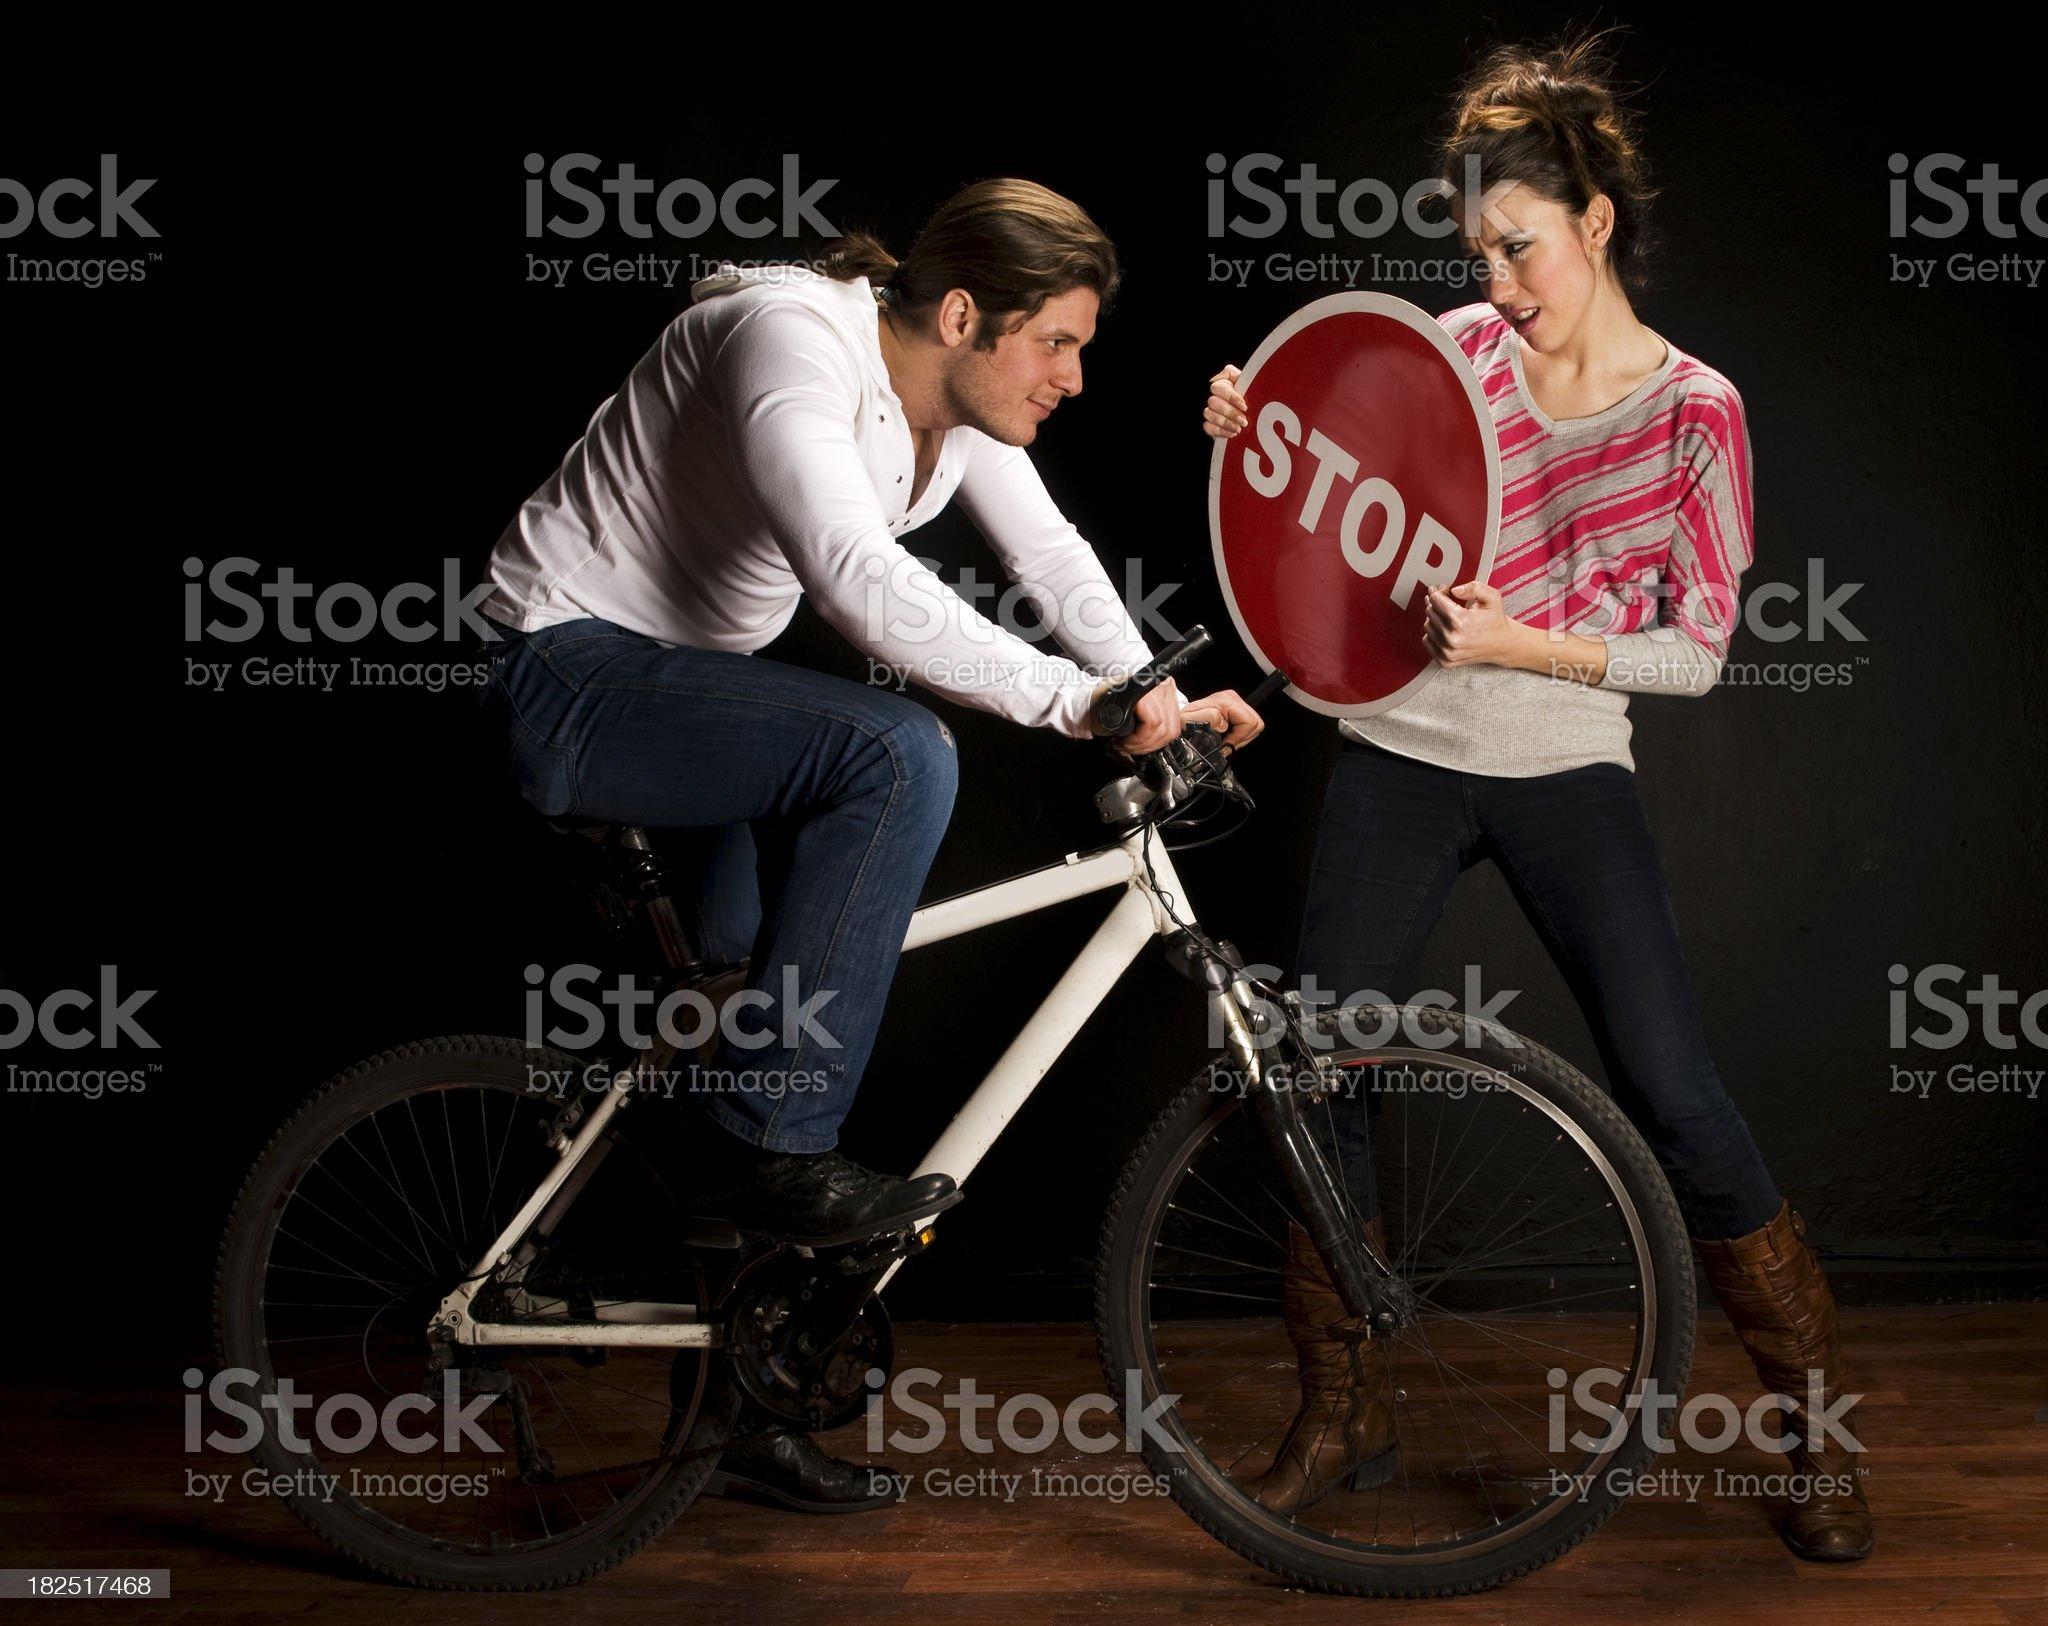 Stop! royalty-free stock photo